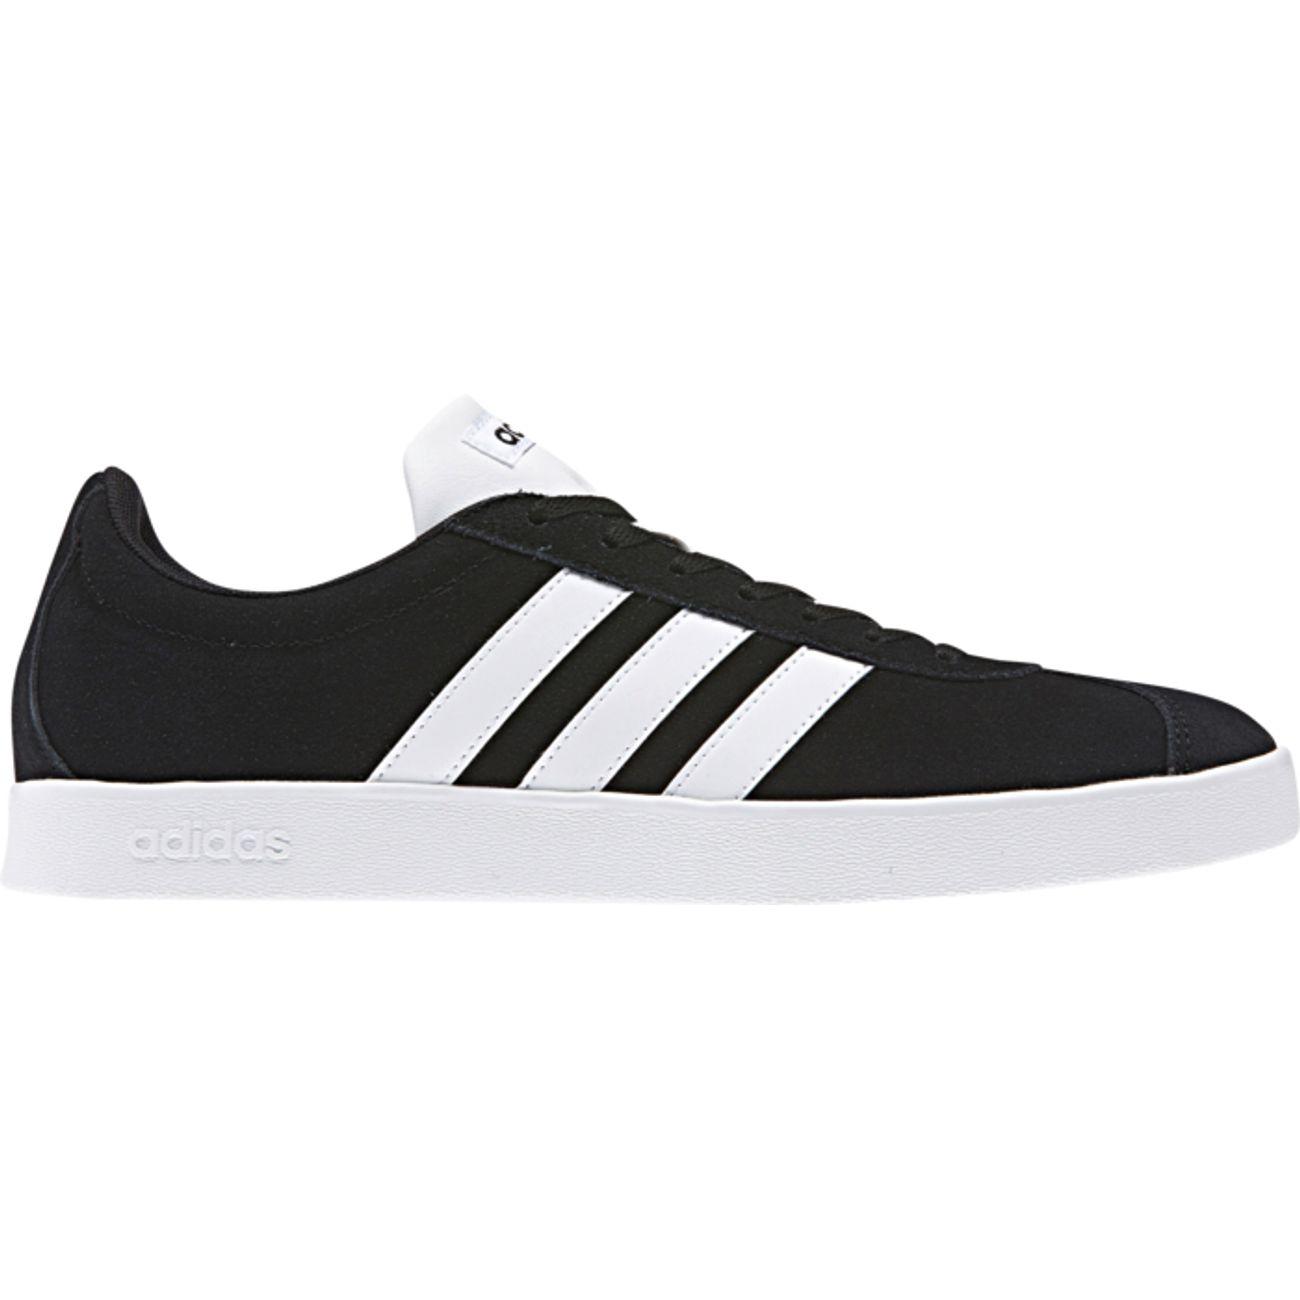 2 Bte Chaussures Basses Adidas 0 Court Homme Vl c53RAjL4q